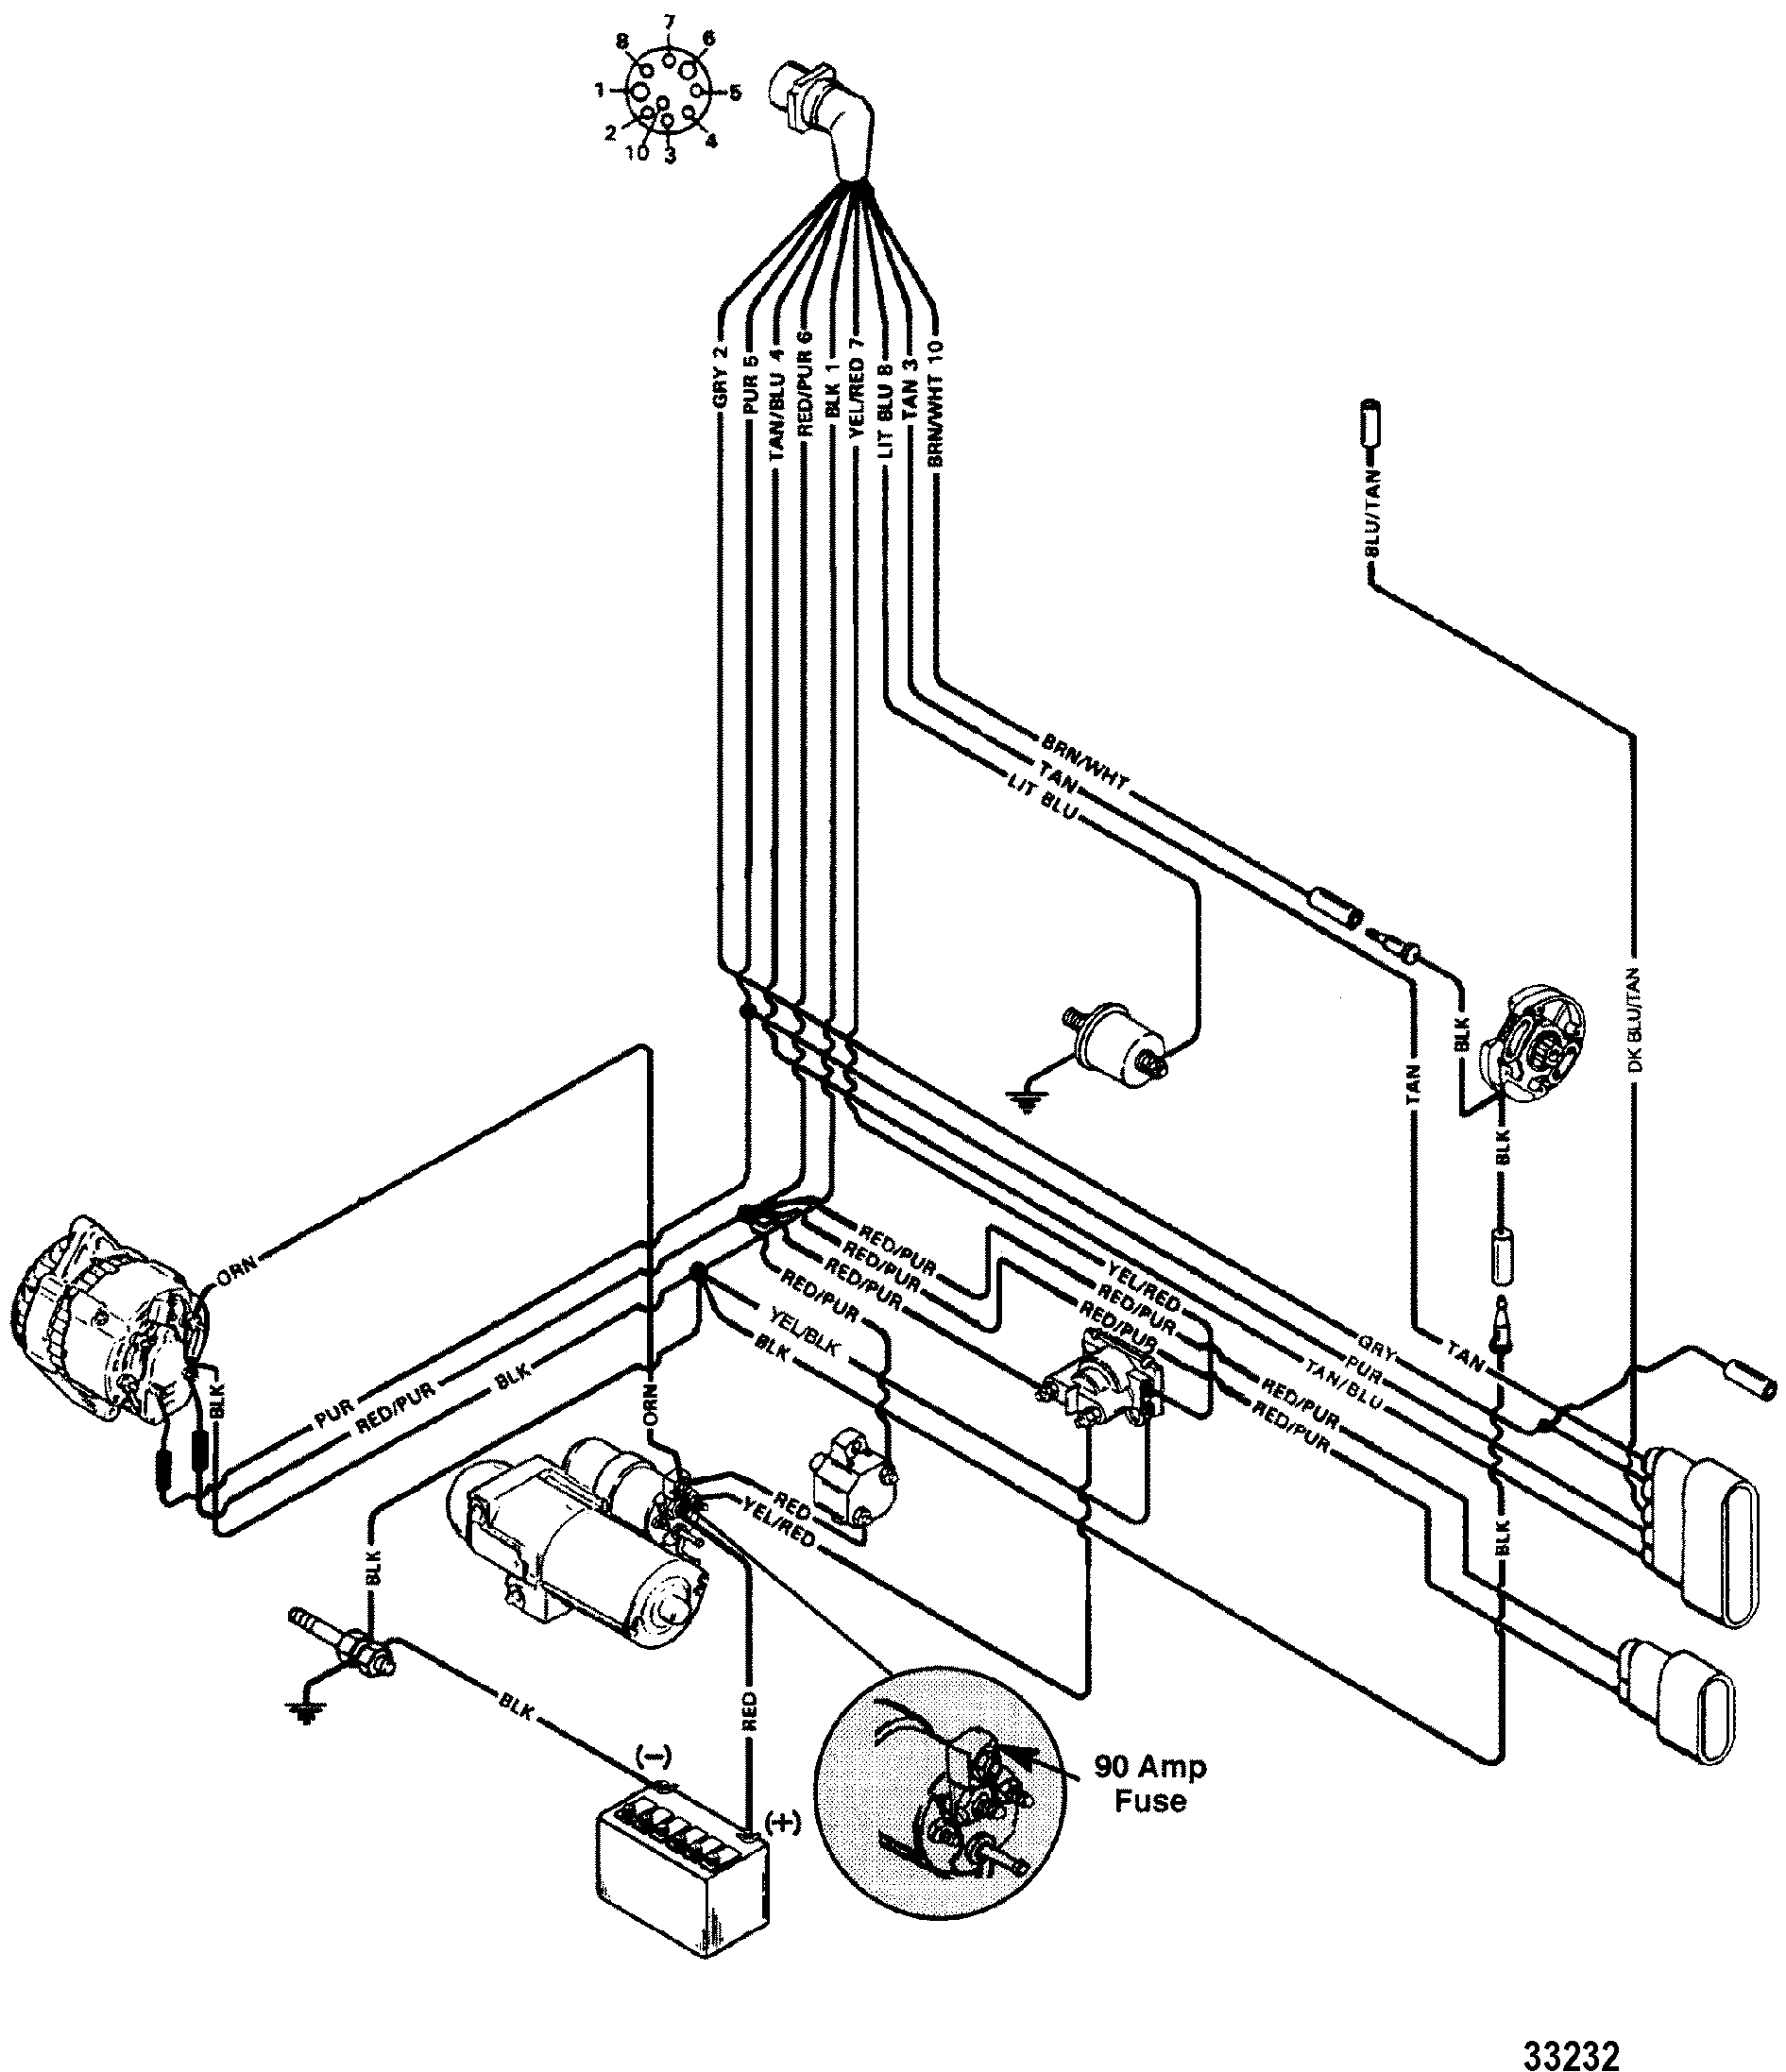 1993 4 3 volvo penta engine wiring diagram #1 volvo penta starter wiring diagram Volvo Penta Cooling System Diagram Volvo Penta Repair Manuals PDF